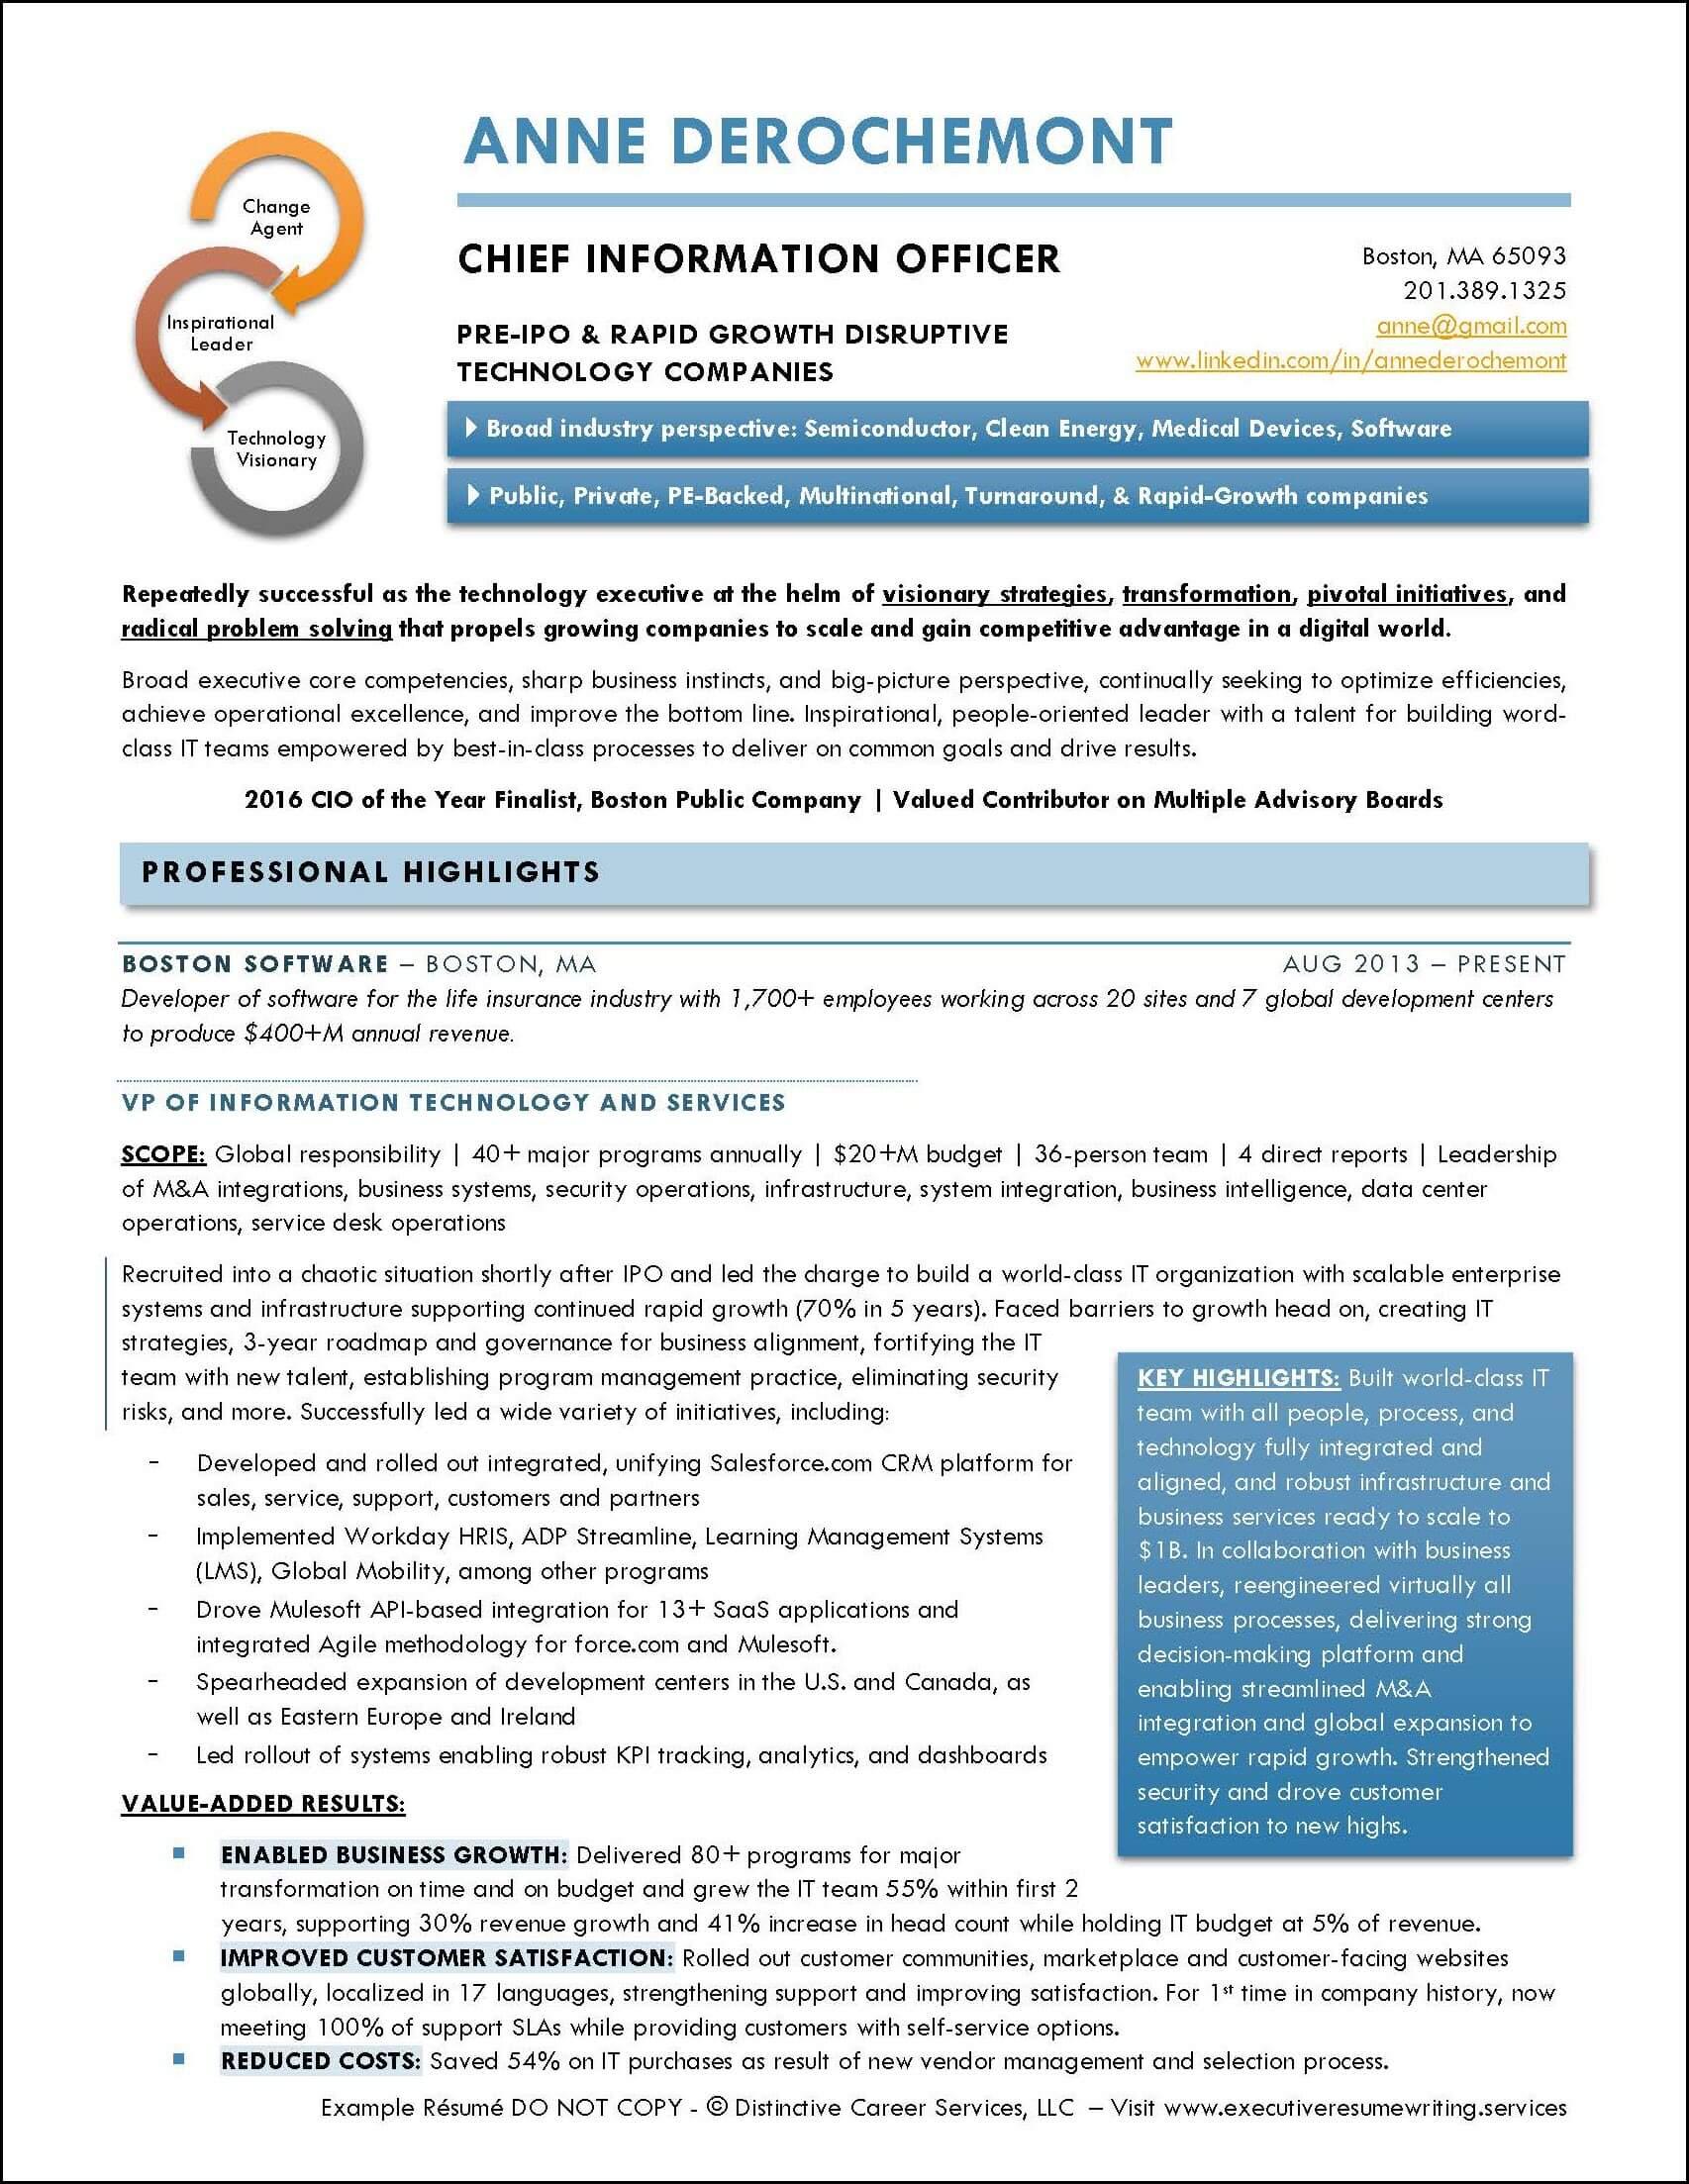 Example Executive Resume - CIO- pg1